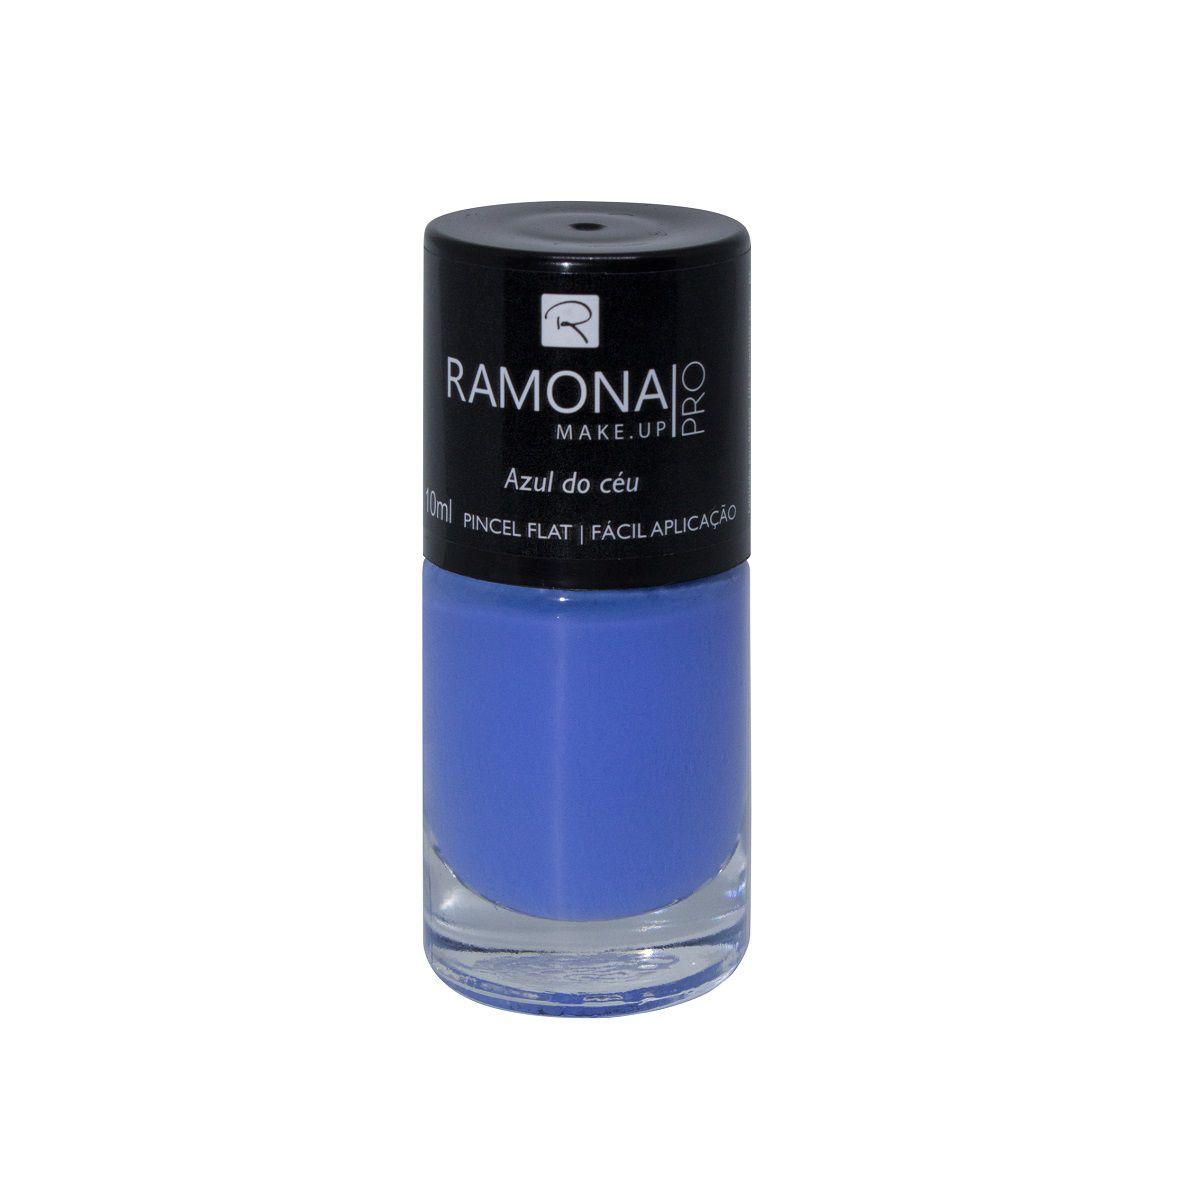 Esmalte cremoso Ramona Cosméticos Azul do céu 10ml